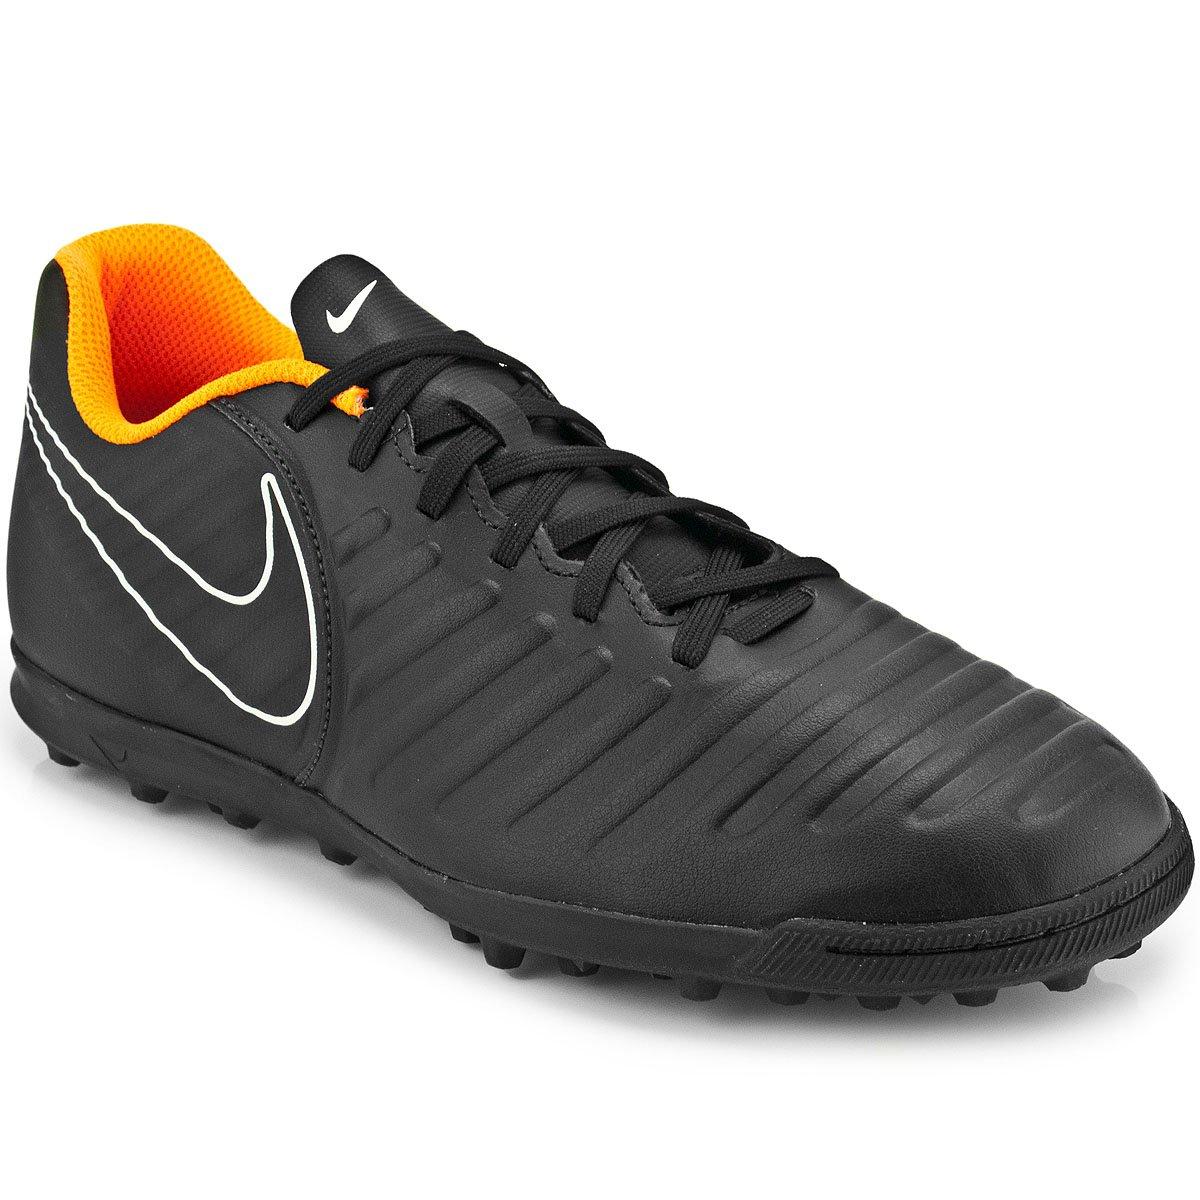 Chuteira Nike Tiempo Legendx 7 Club TF  57644c8208a29